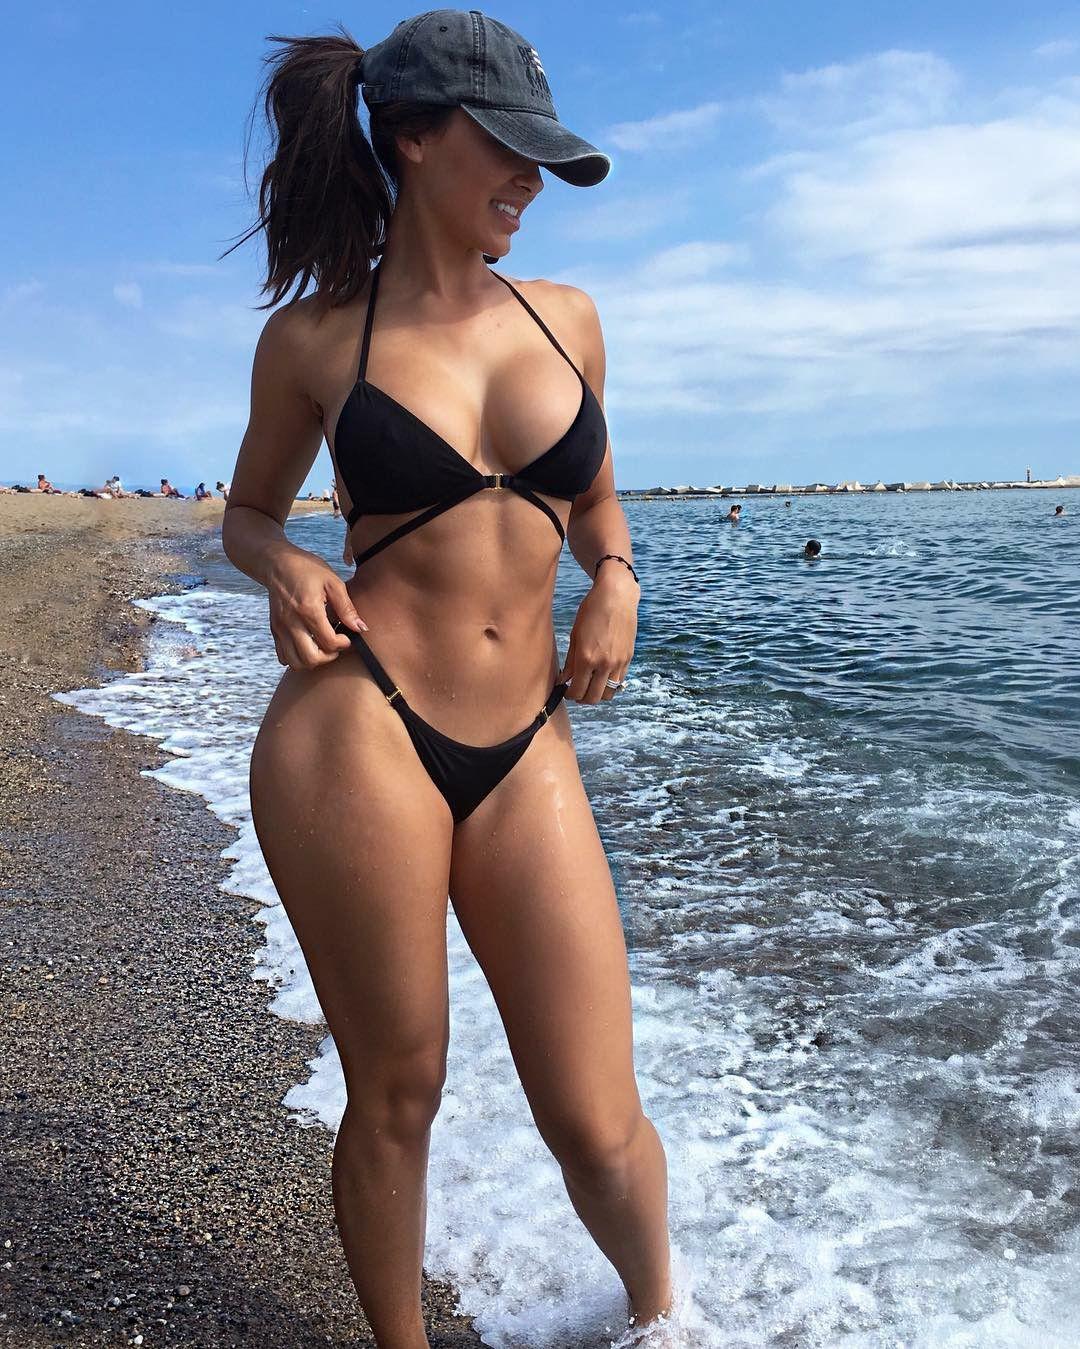 Hot Black Bikini Babes